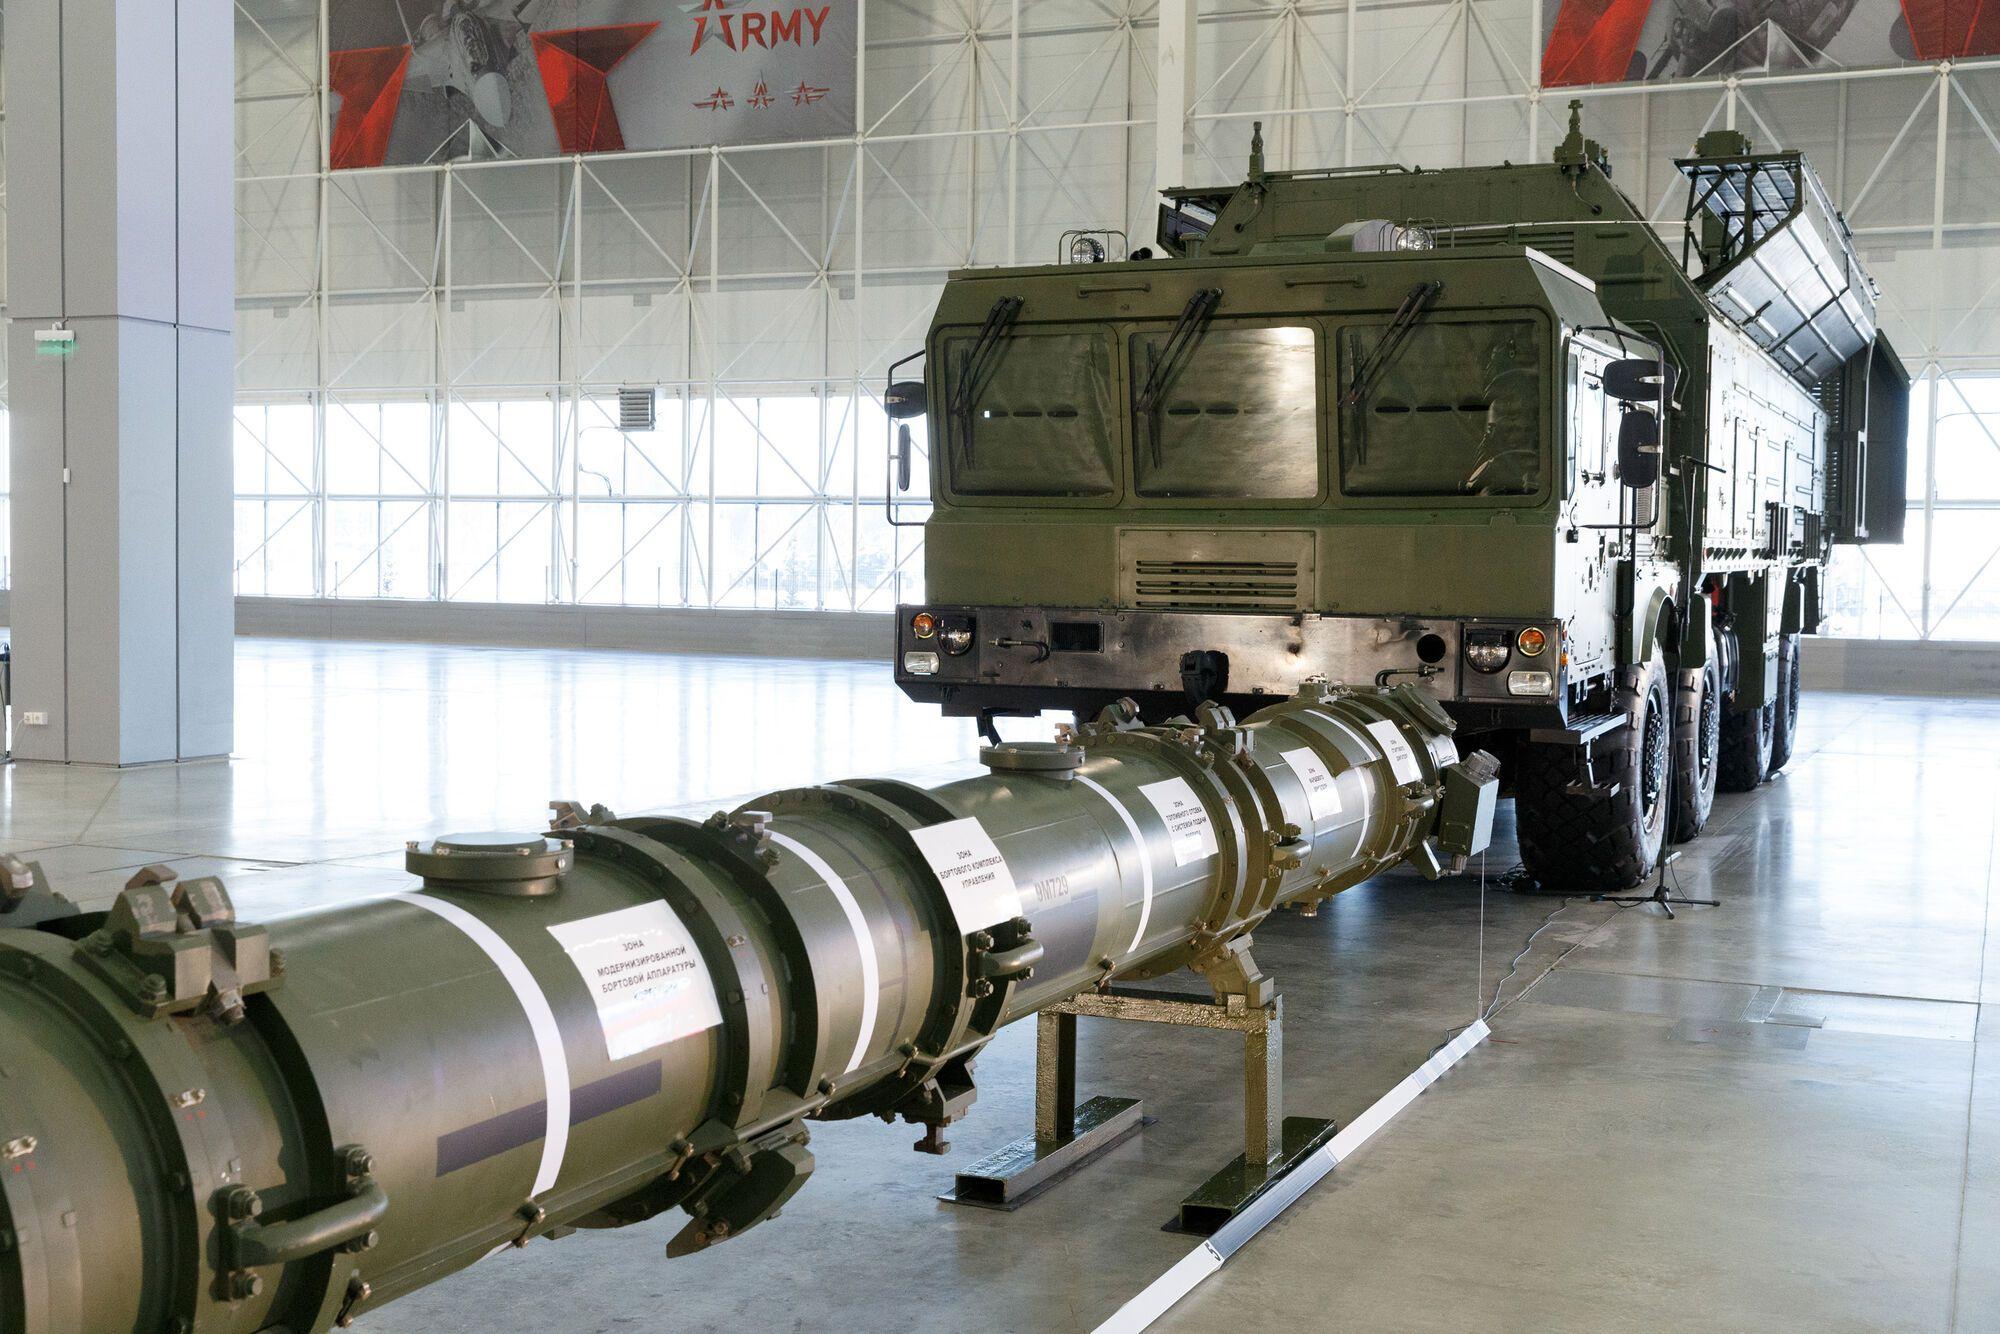 Самохідна пускова установка ракет 9М729